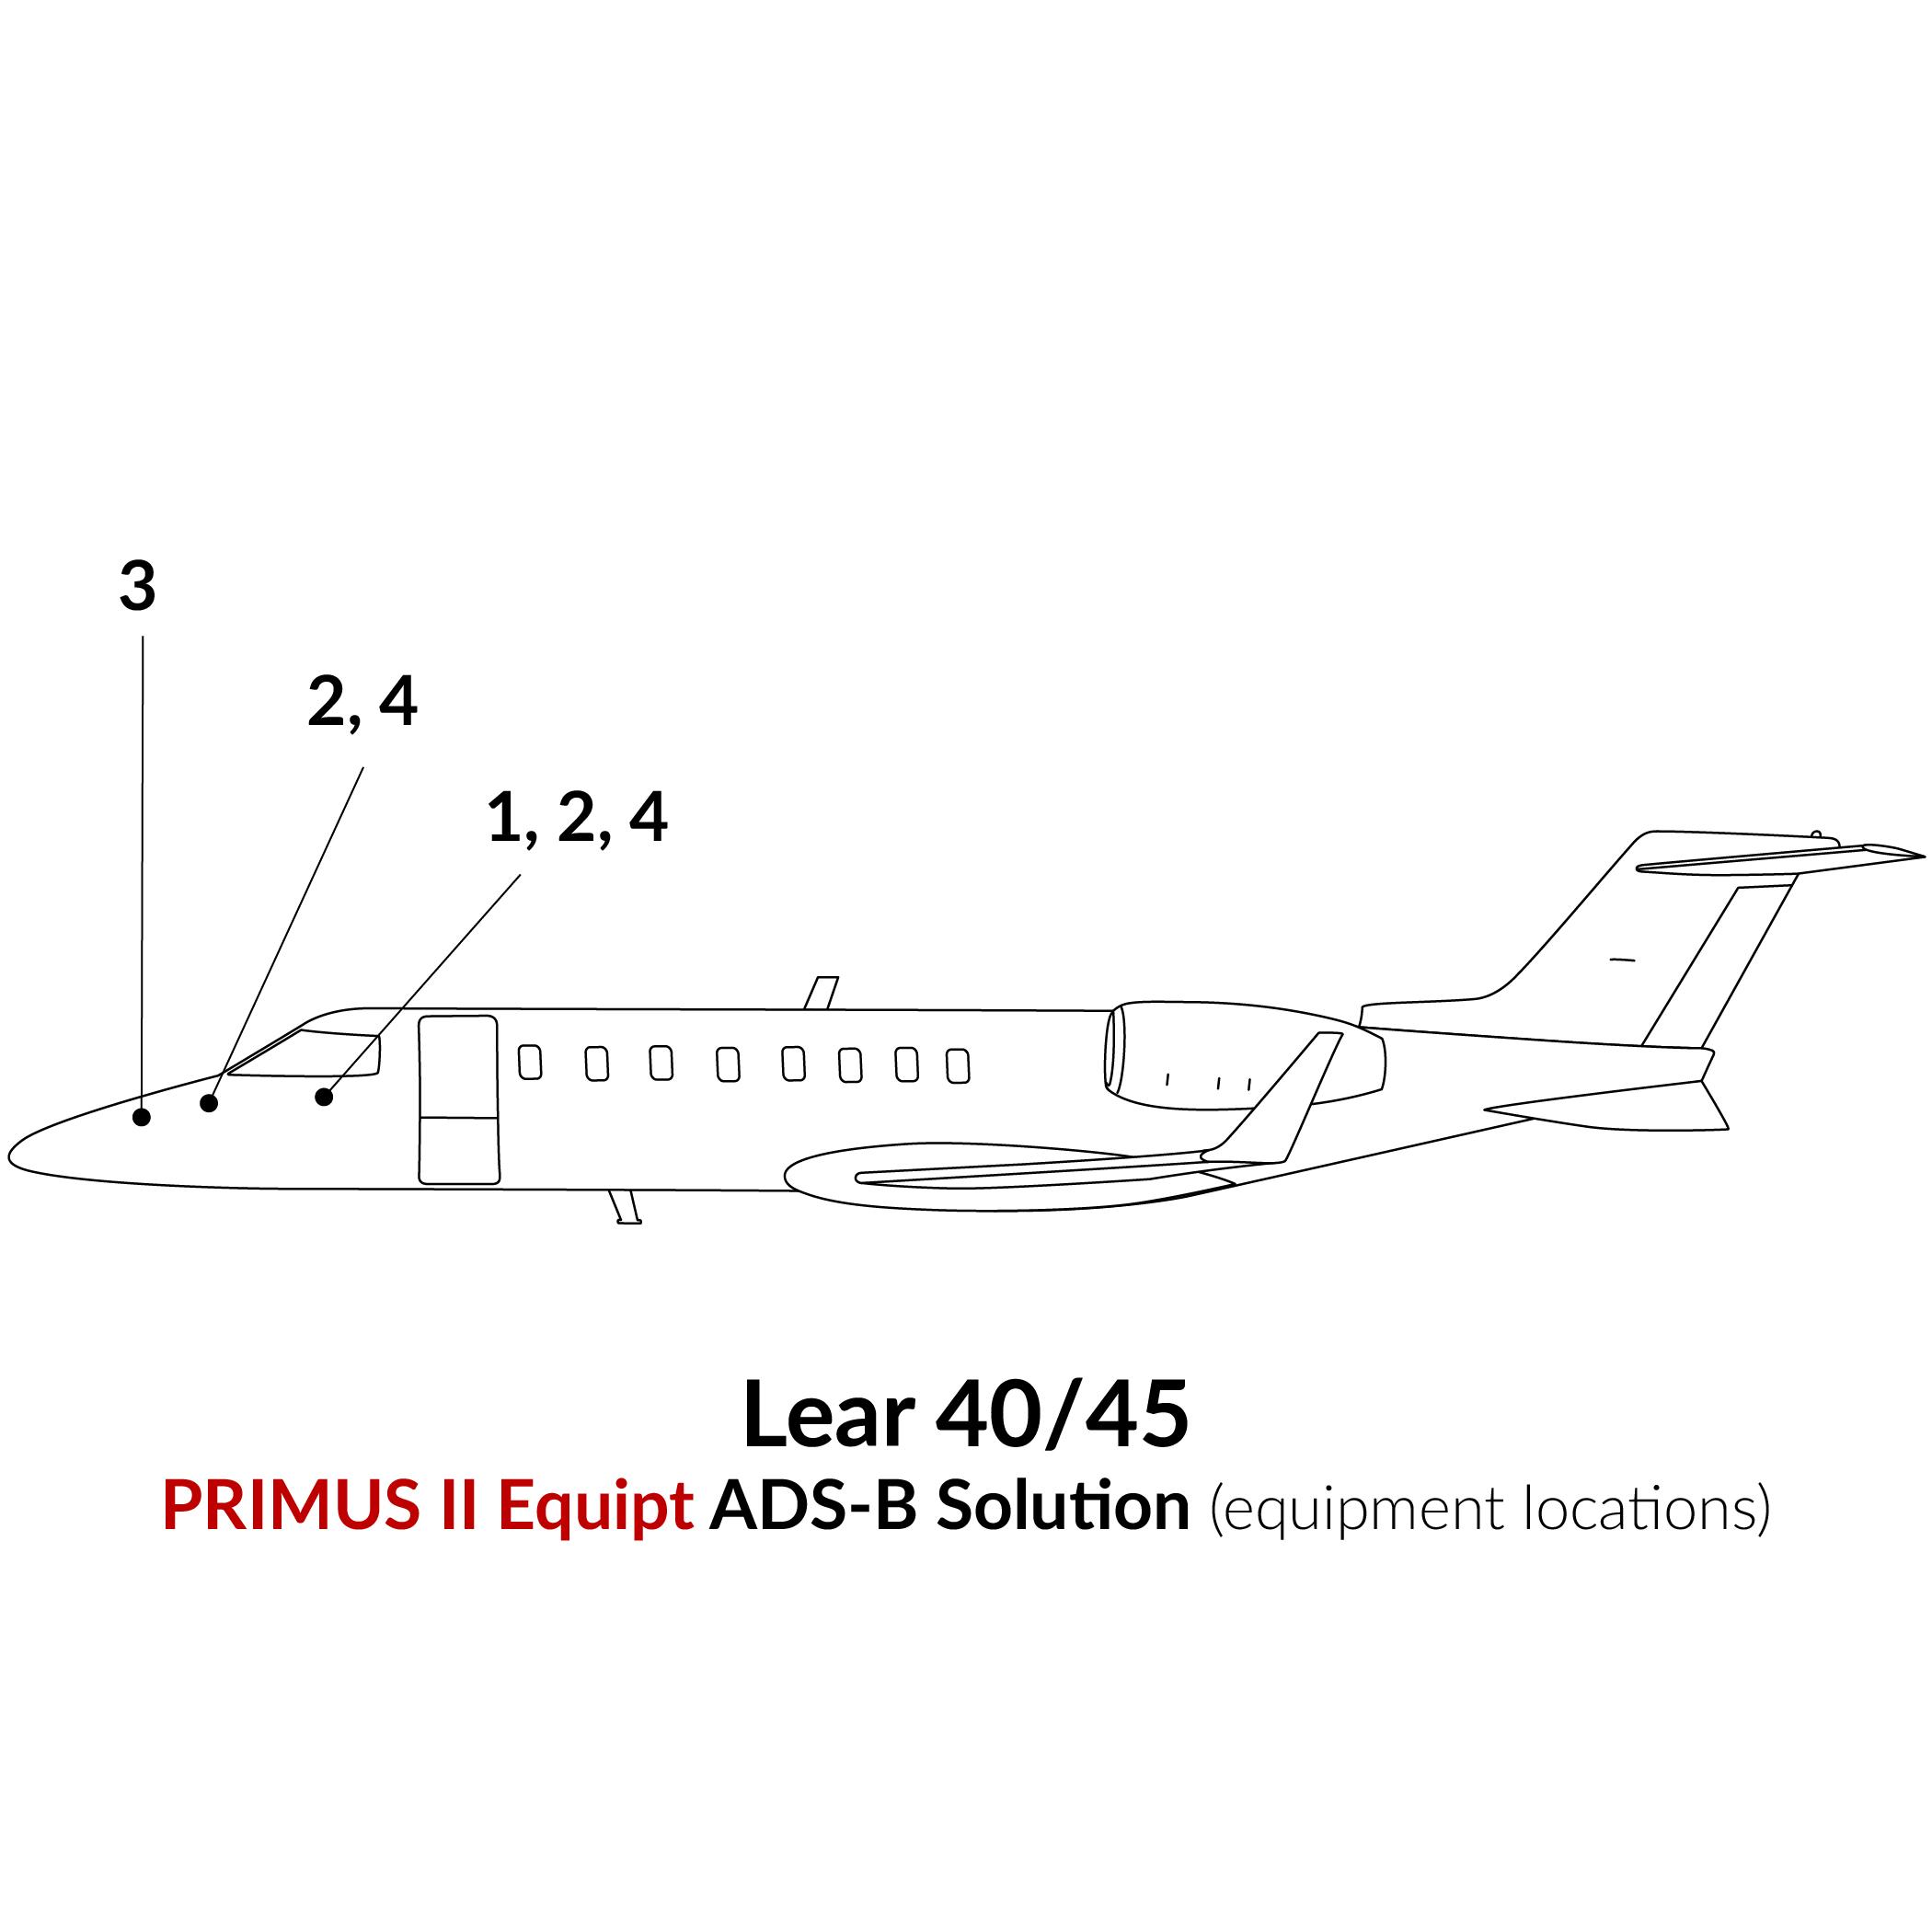 Lear 45_Honeywell Primus II.jpg